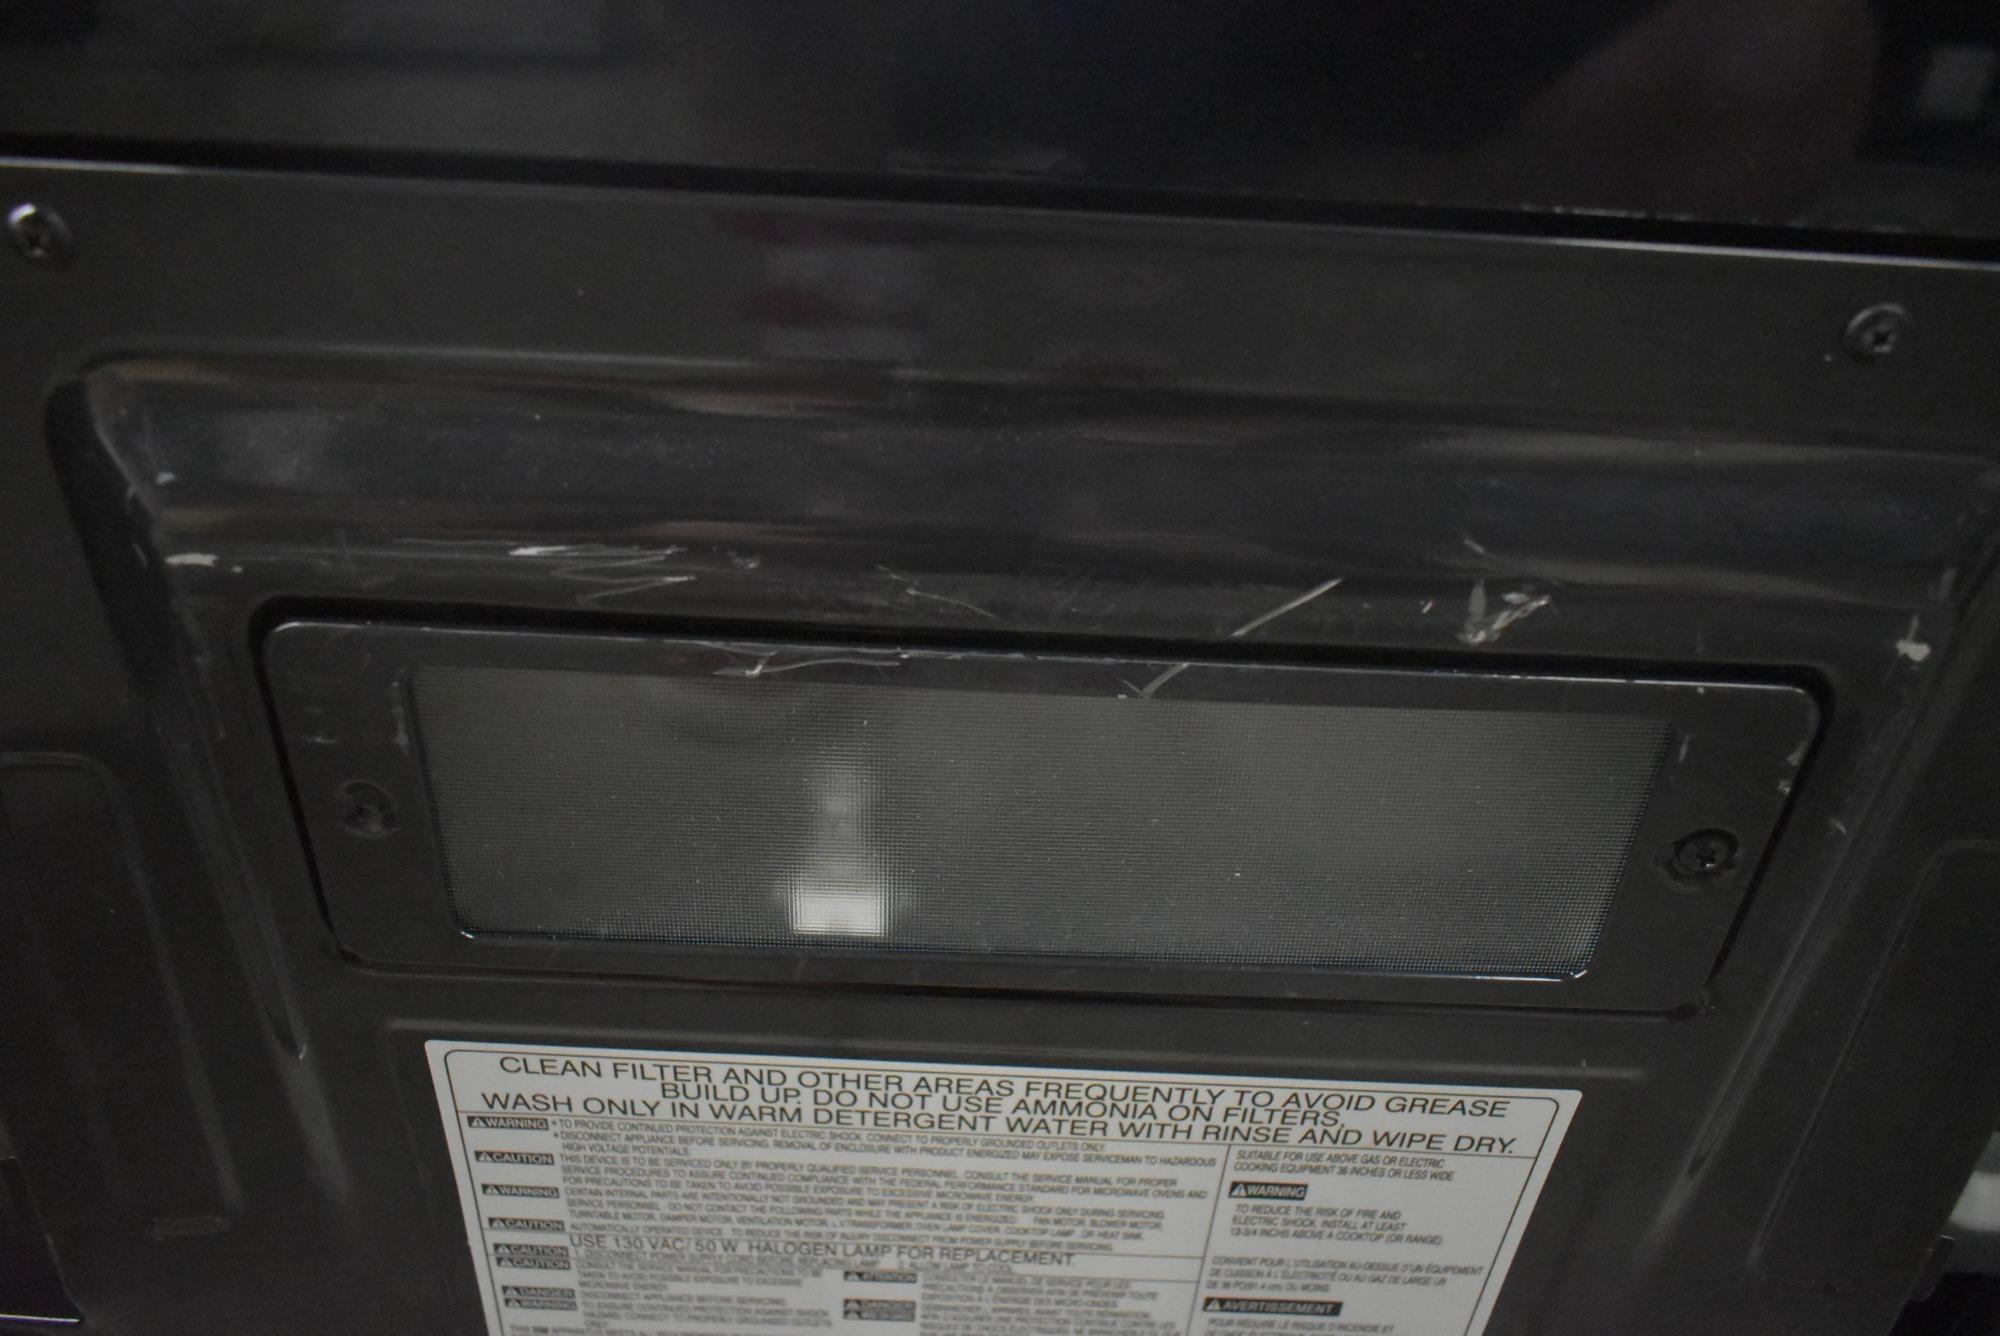 LG Stainless Steel over-The-Range Microwave Oven-LMV2031ST